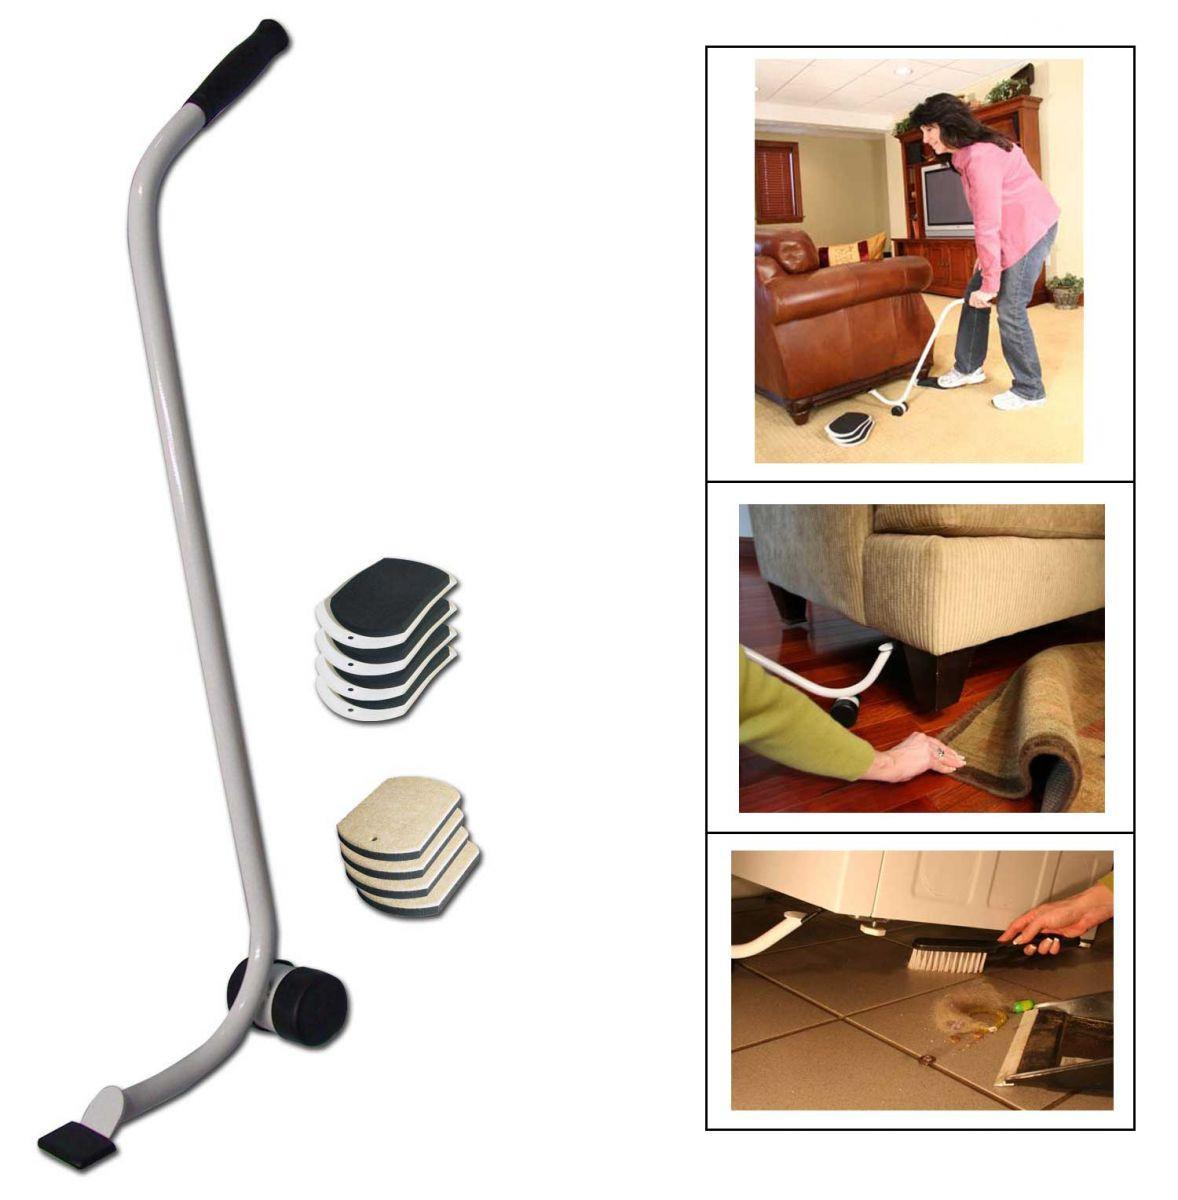 EZ Moves Home Appliance Tool adalah alat yang dapat membantu Anda untuk memindahkan barang atau perabotan